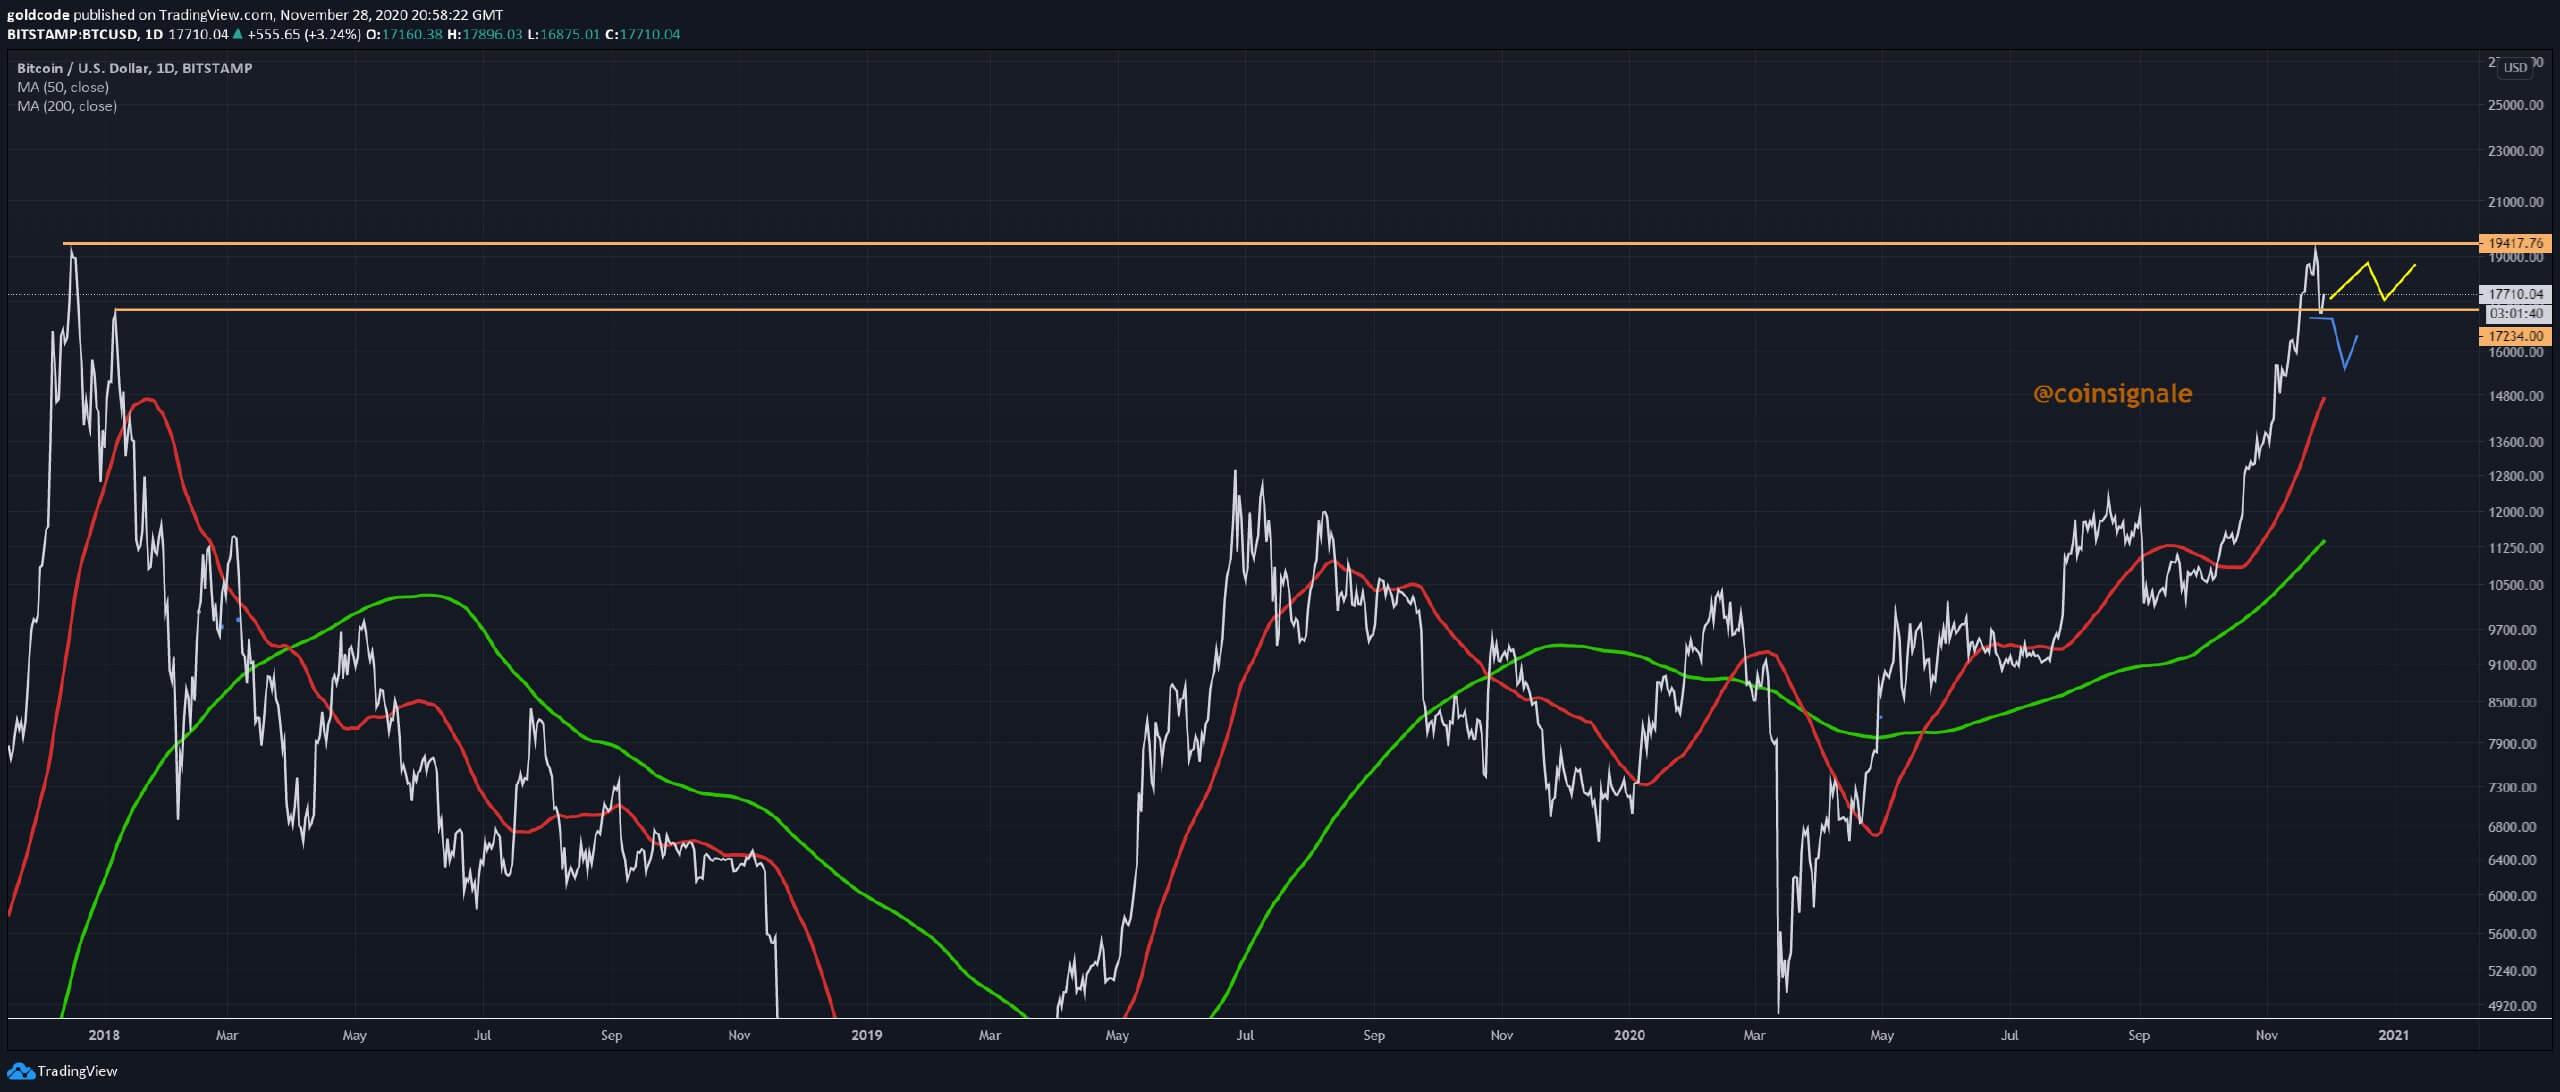 Krypto Signale Chart Tradingview Bitcoin Unterstützung